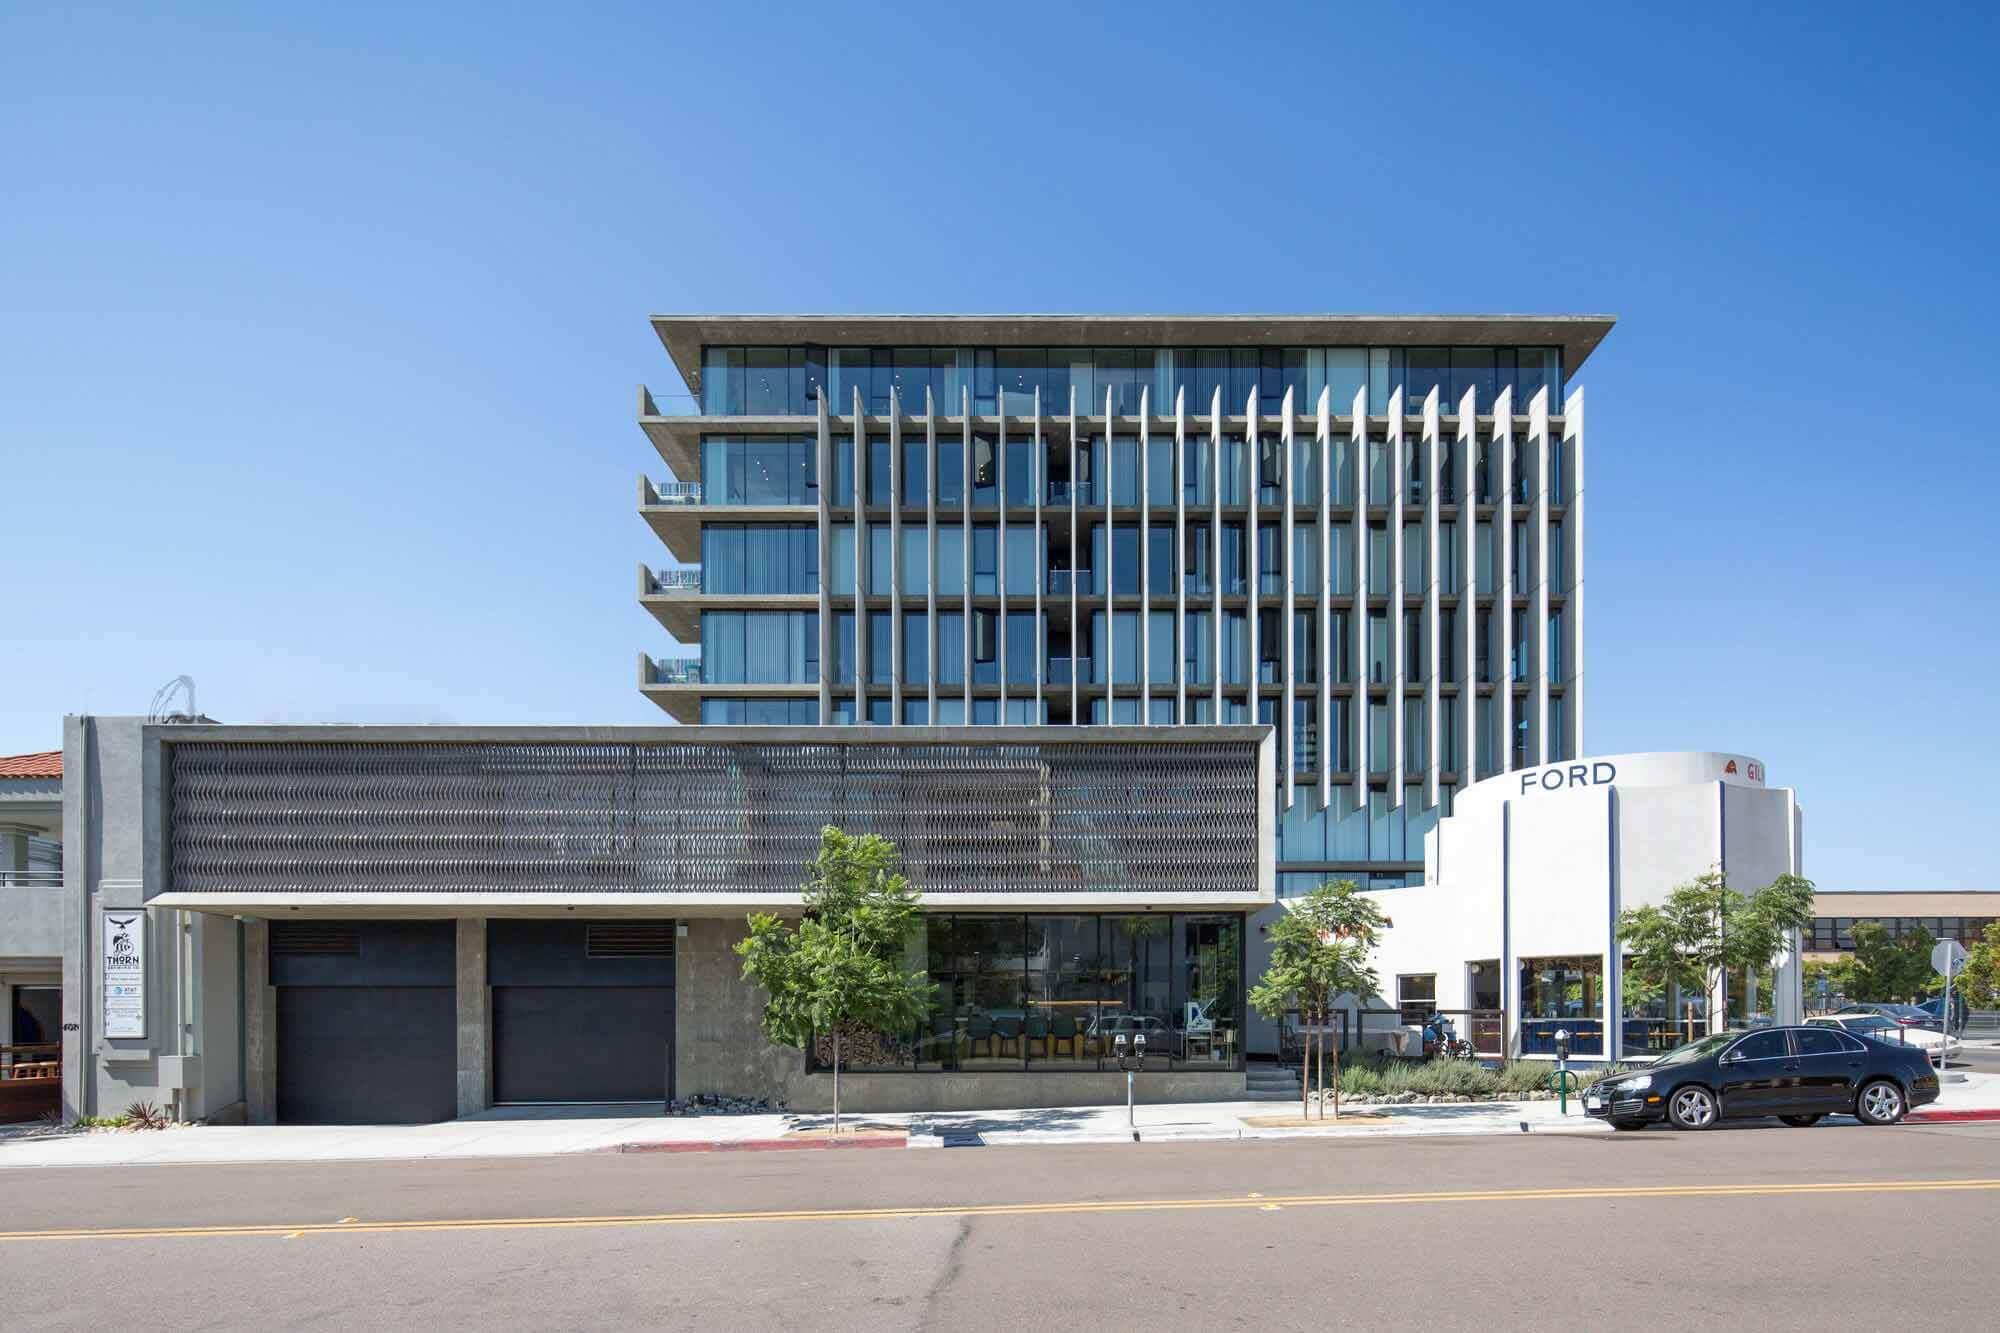 Апартаменты «Форт» / архитектор Джонатана Сигала